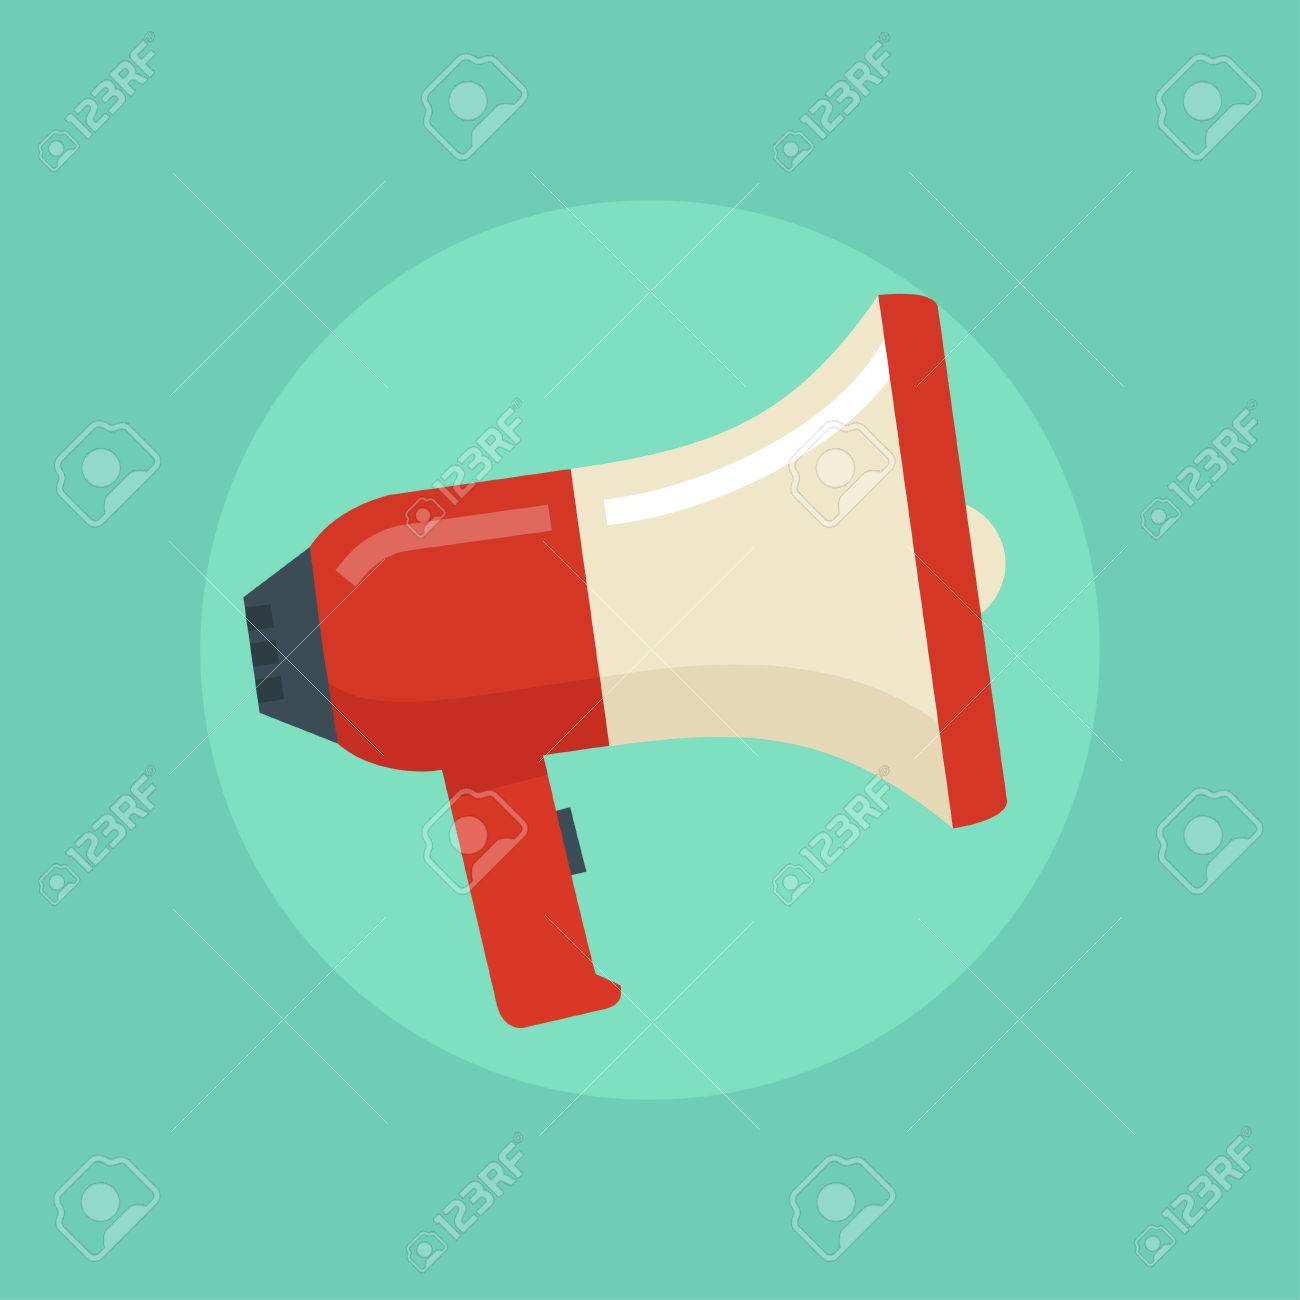 loudspeaker vector illustration megaphone flat symbol loudspeaker royalty free cliparts vectors and stock illustration image 54630347 loudspeaker vector illustration megaphone flat symbol loudspeaker